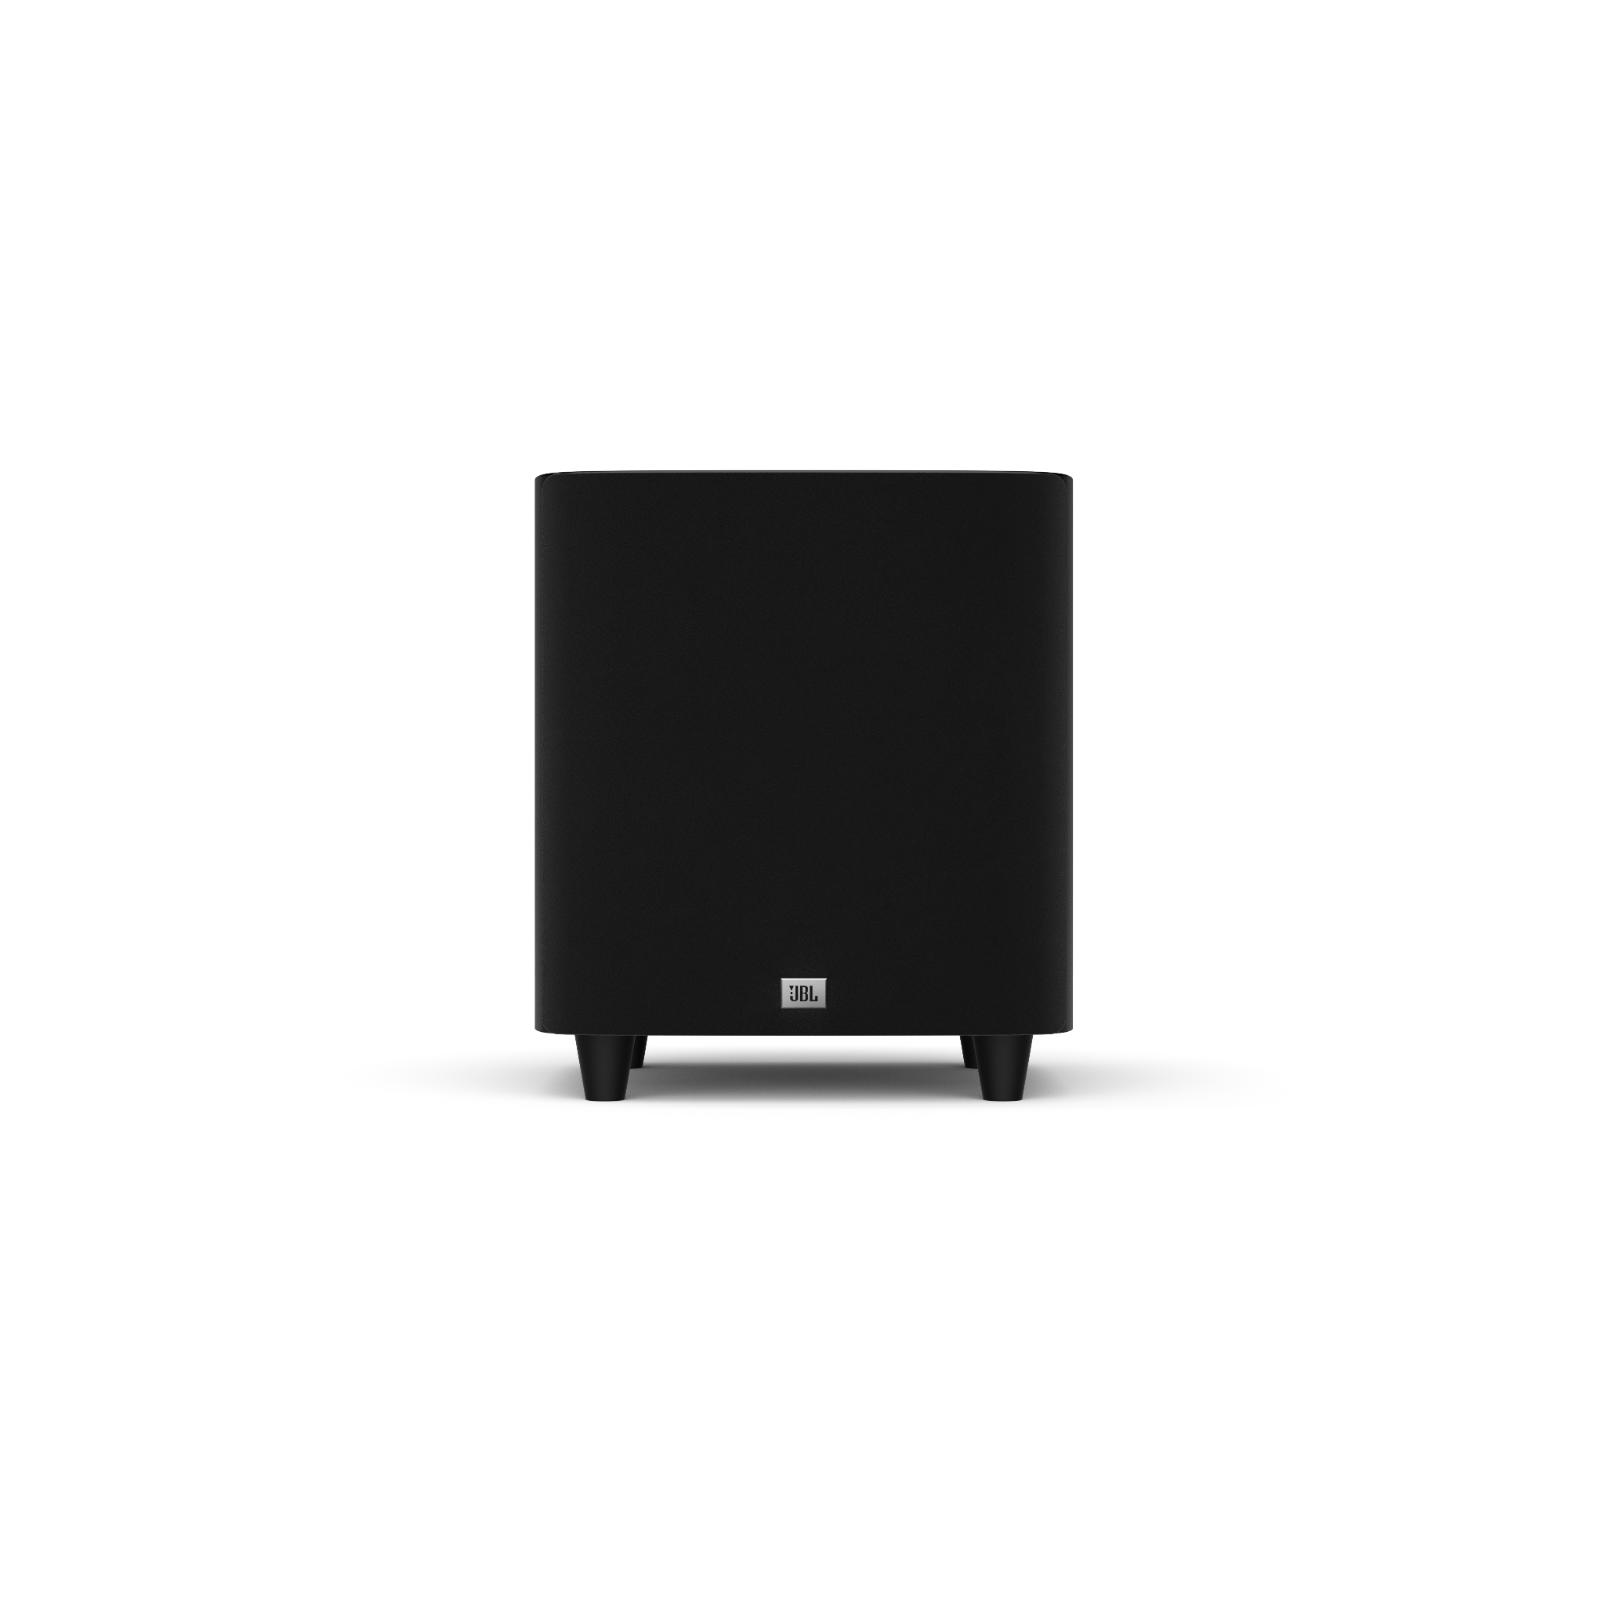 JBL STUDIO 650P - Dark Wood - Home Audio Loudspeaker System - Front